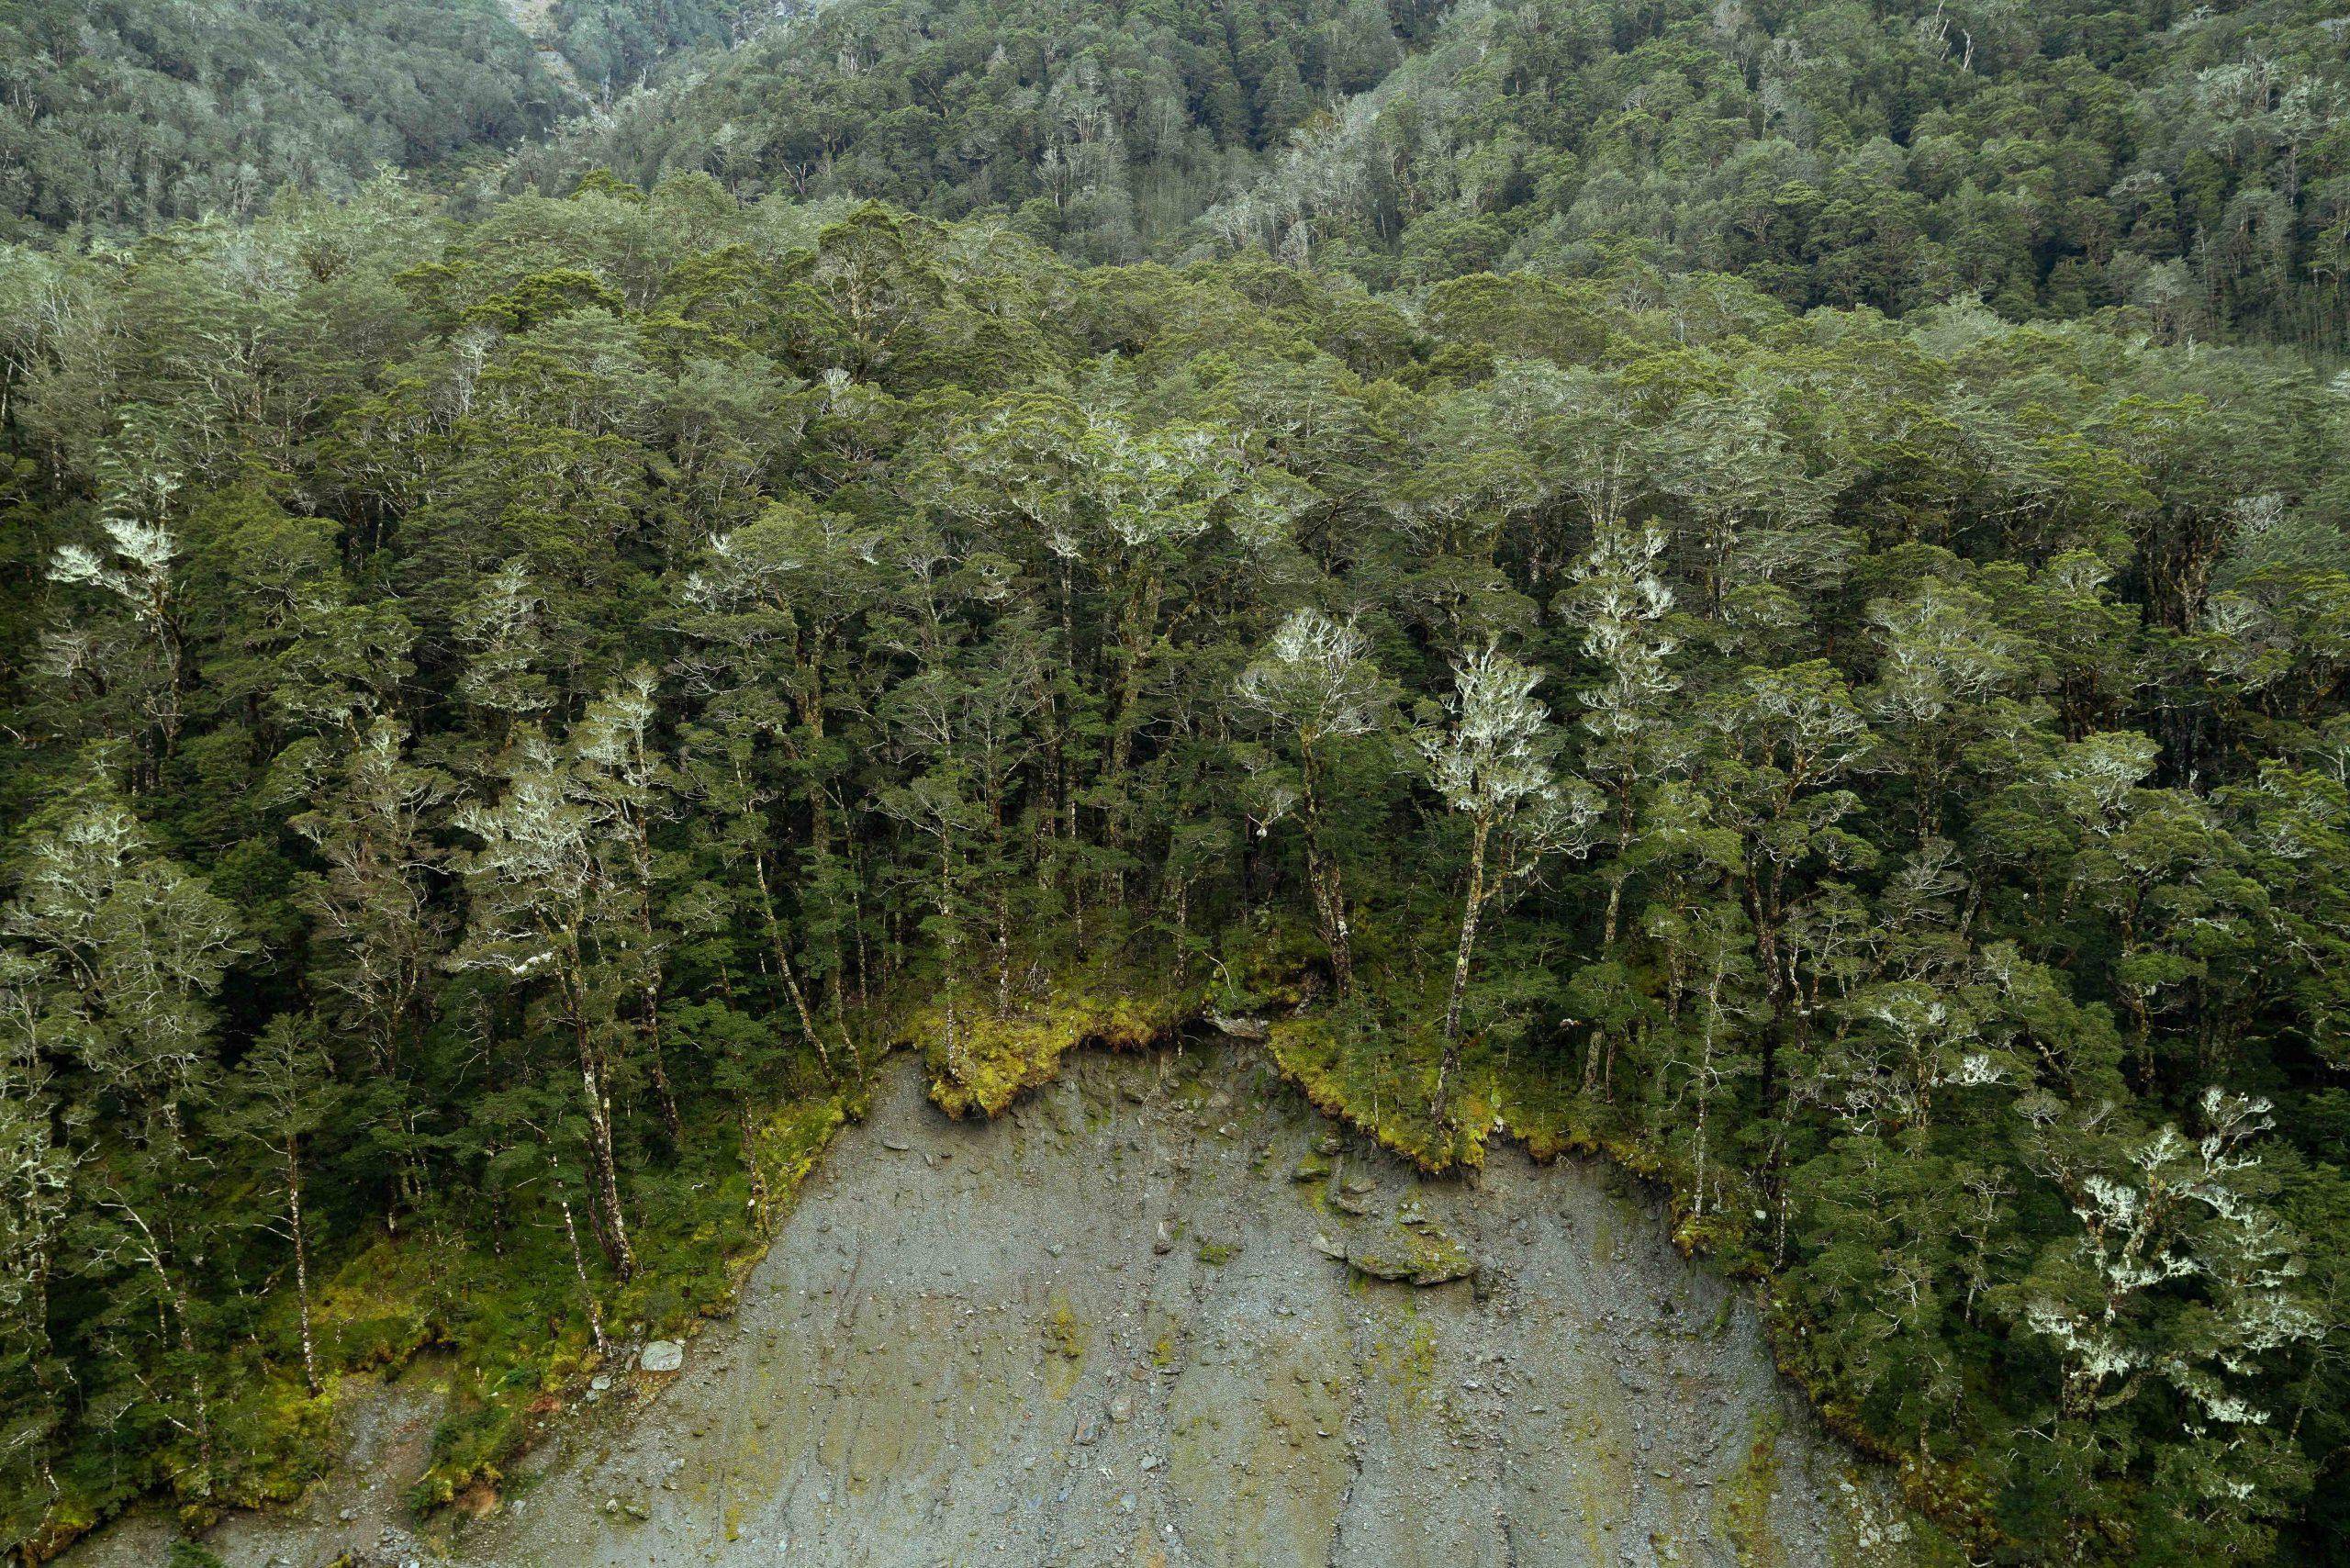 fotografia paesaggistica a colori di una foresta di Louise Coghill